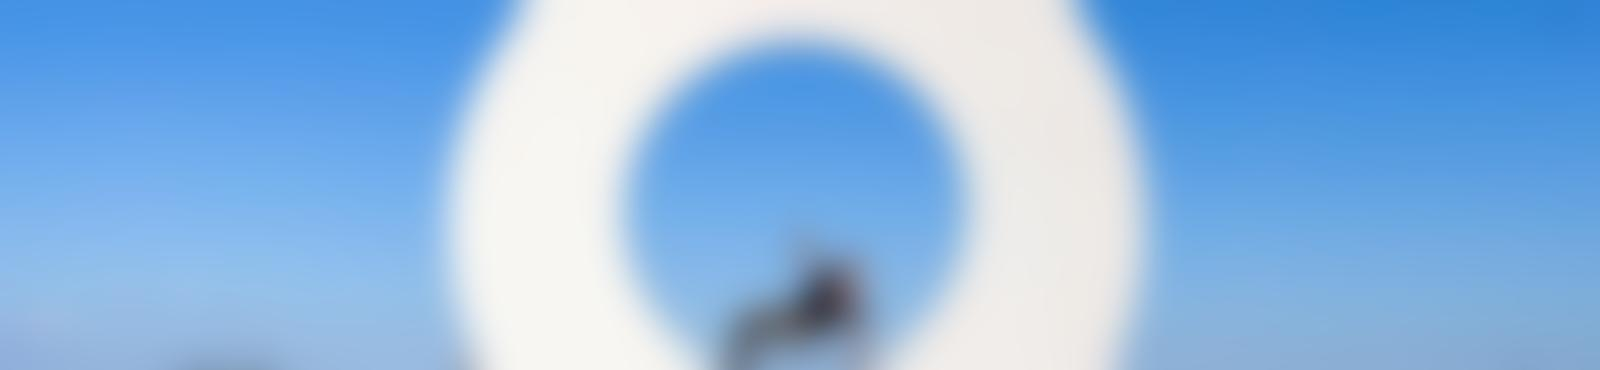 Blurred 2584fce8 bcb3 4c8c a694 f19cd3d988d2